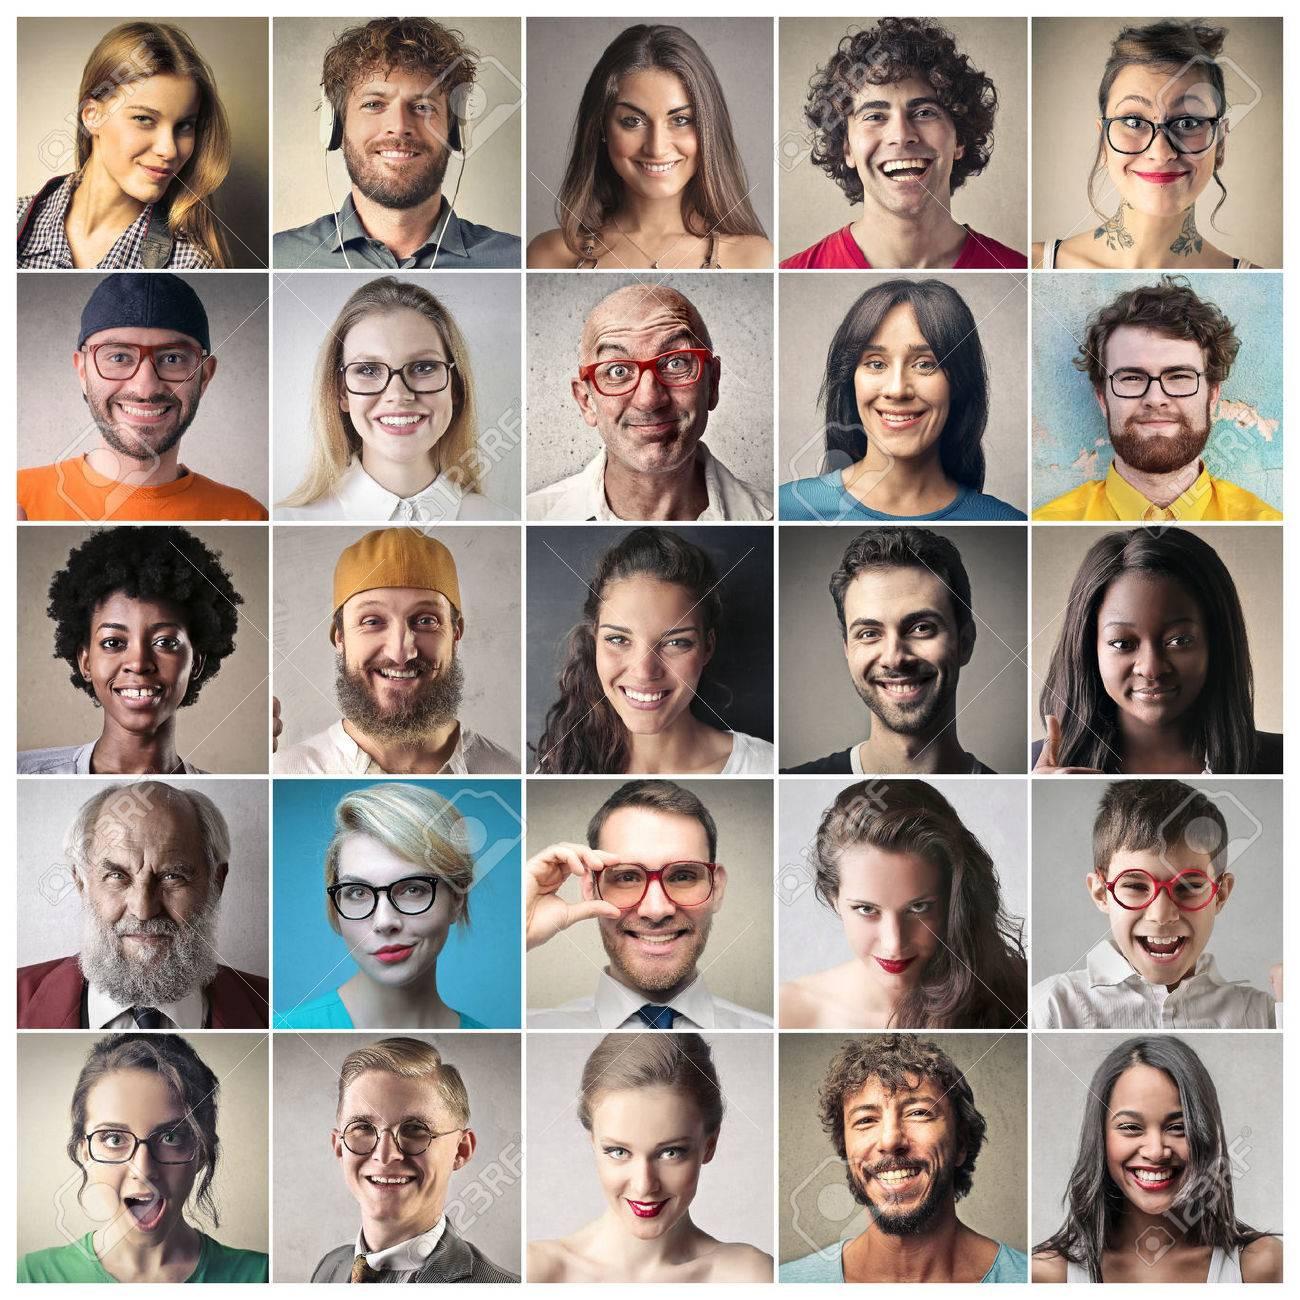 76802392-twentyfive-different-faces.jpg